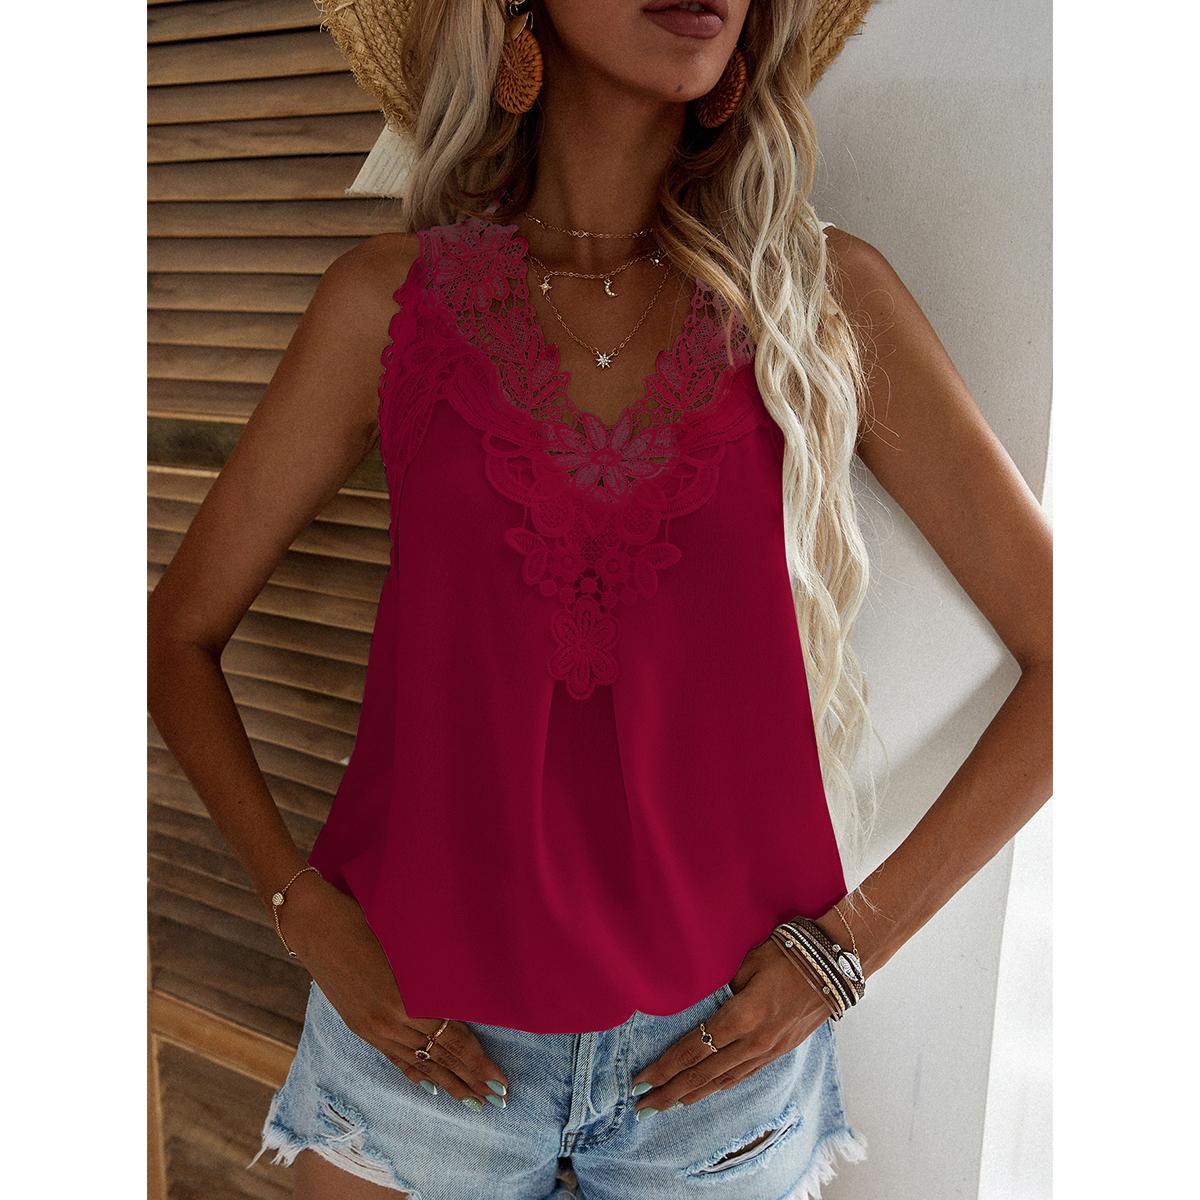 Однотонная блуза с кружевом SheIn swblouse23210519485